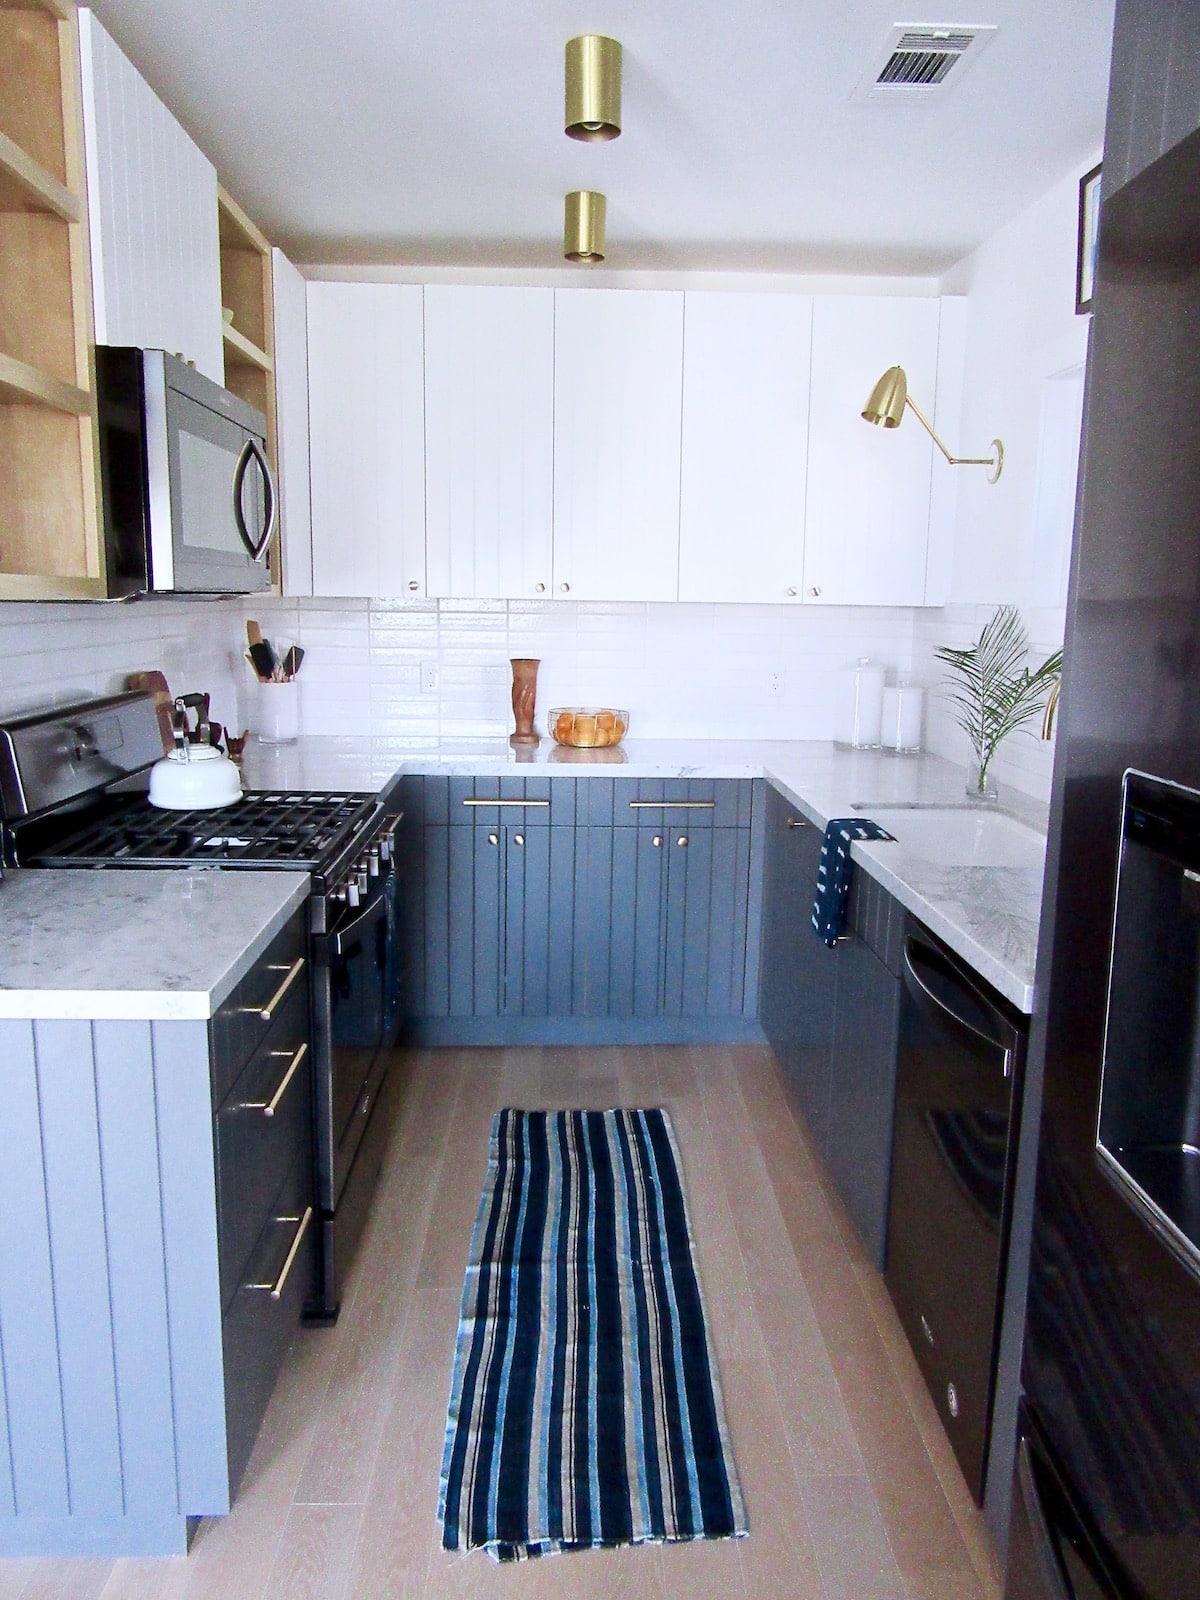 Silver Lake Small Kitchen Remodel Black Appliance Trend